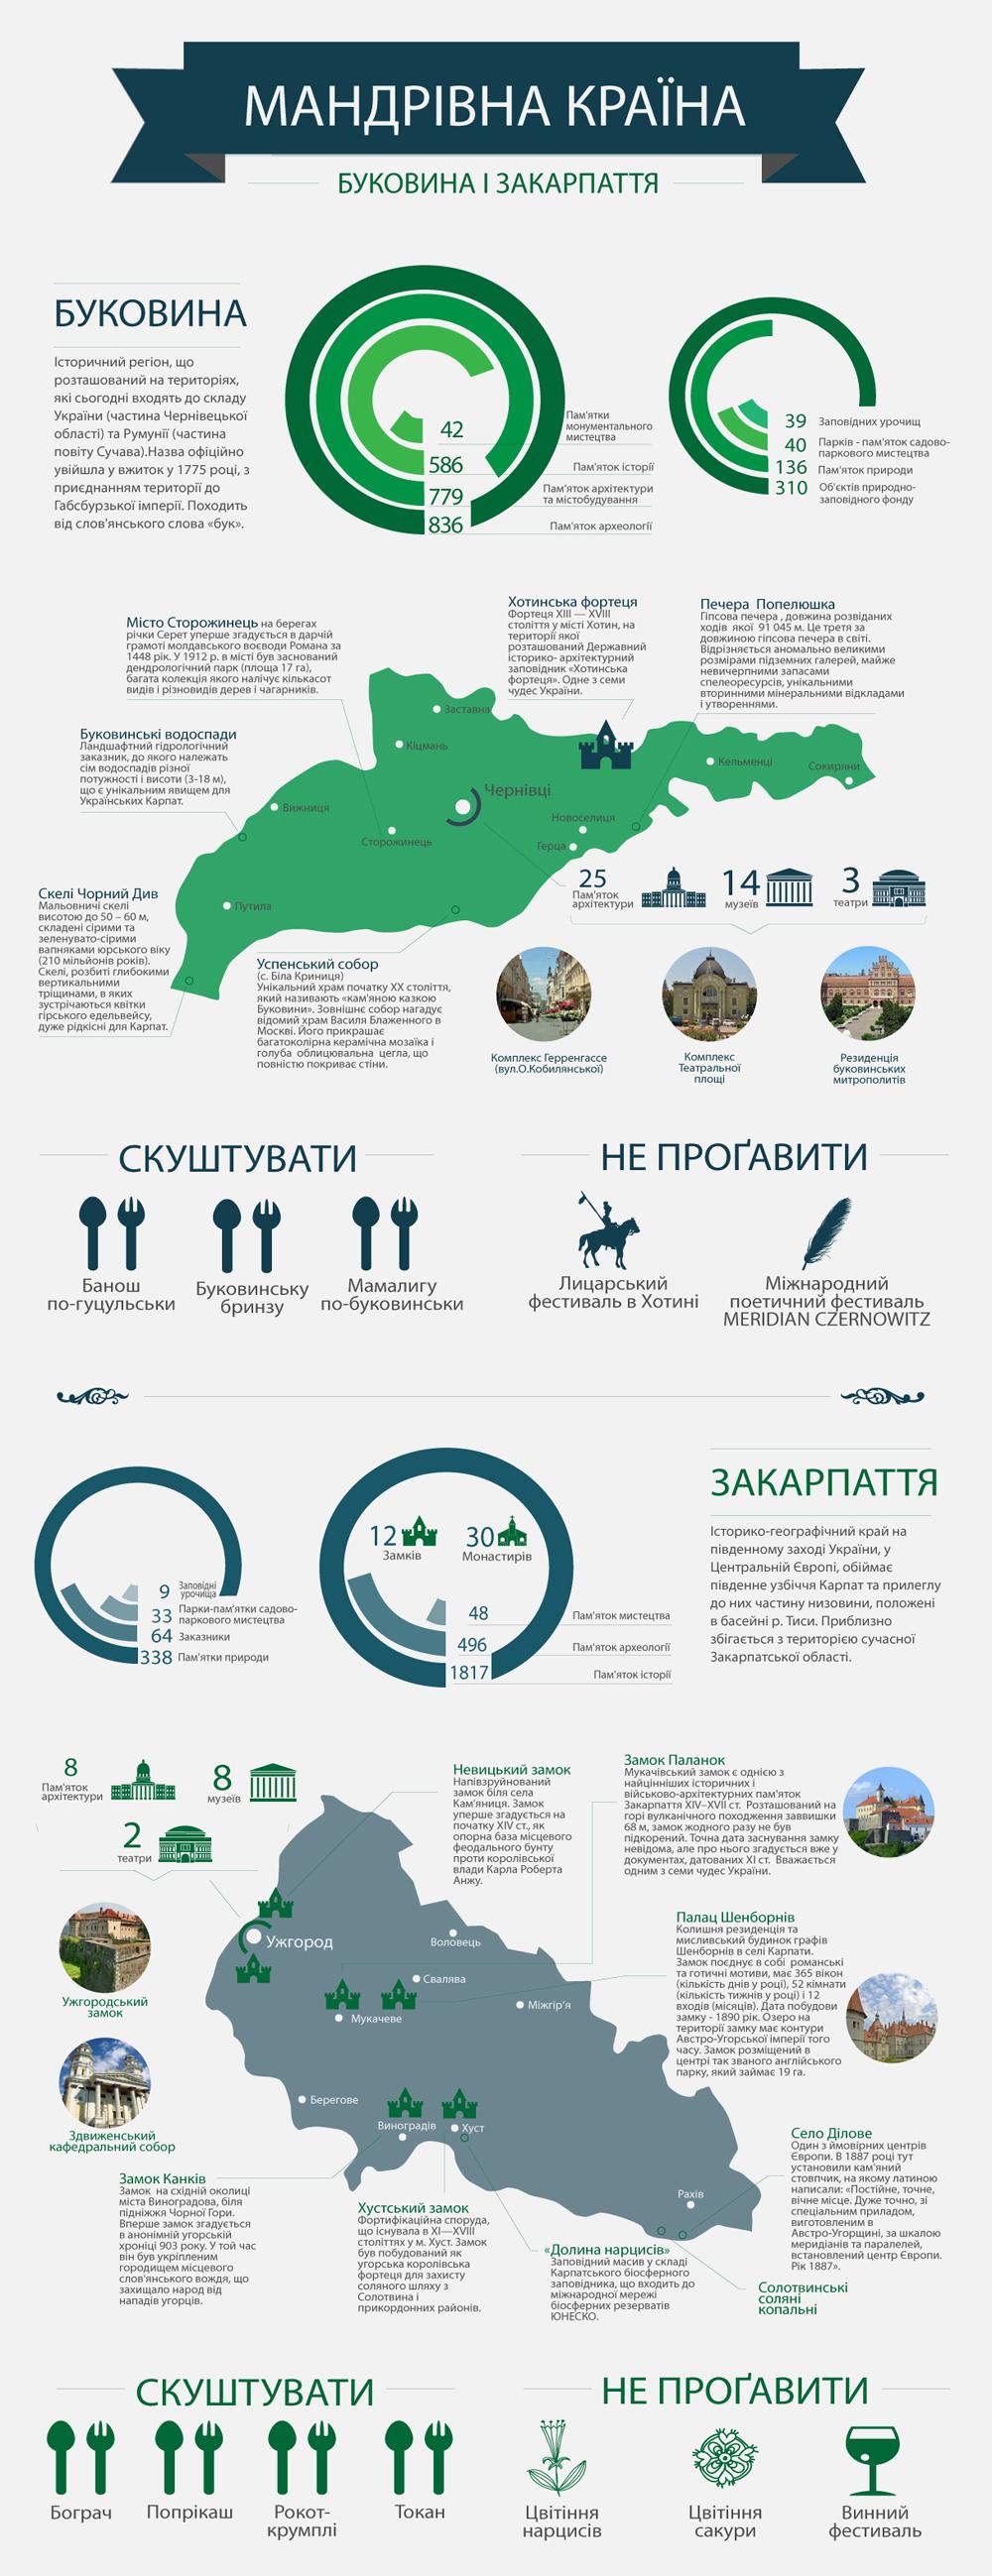 picture_bukovynazakarpattia_4863_p0.jpg